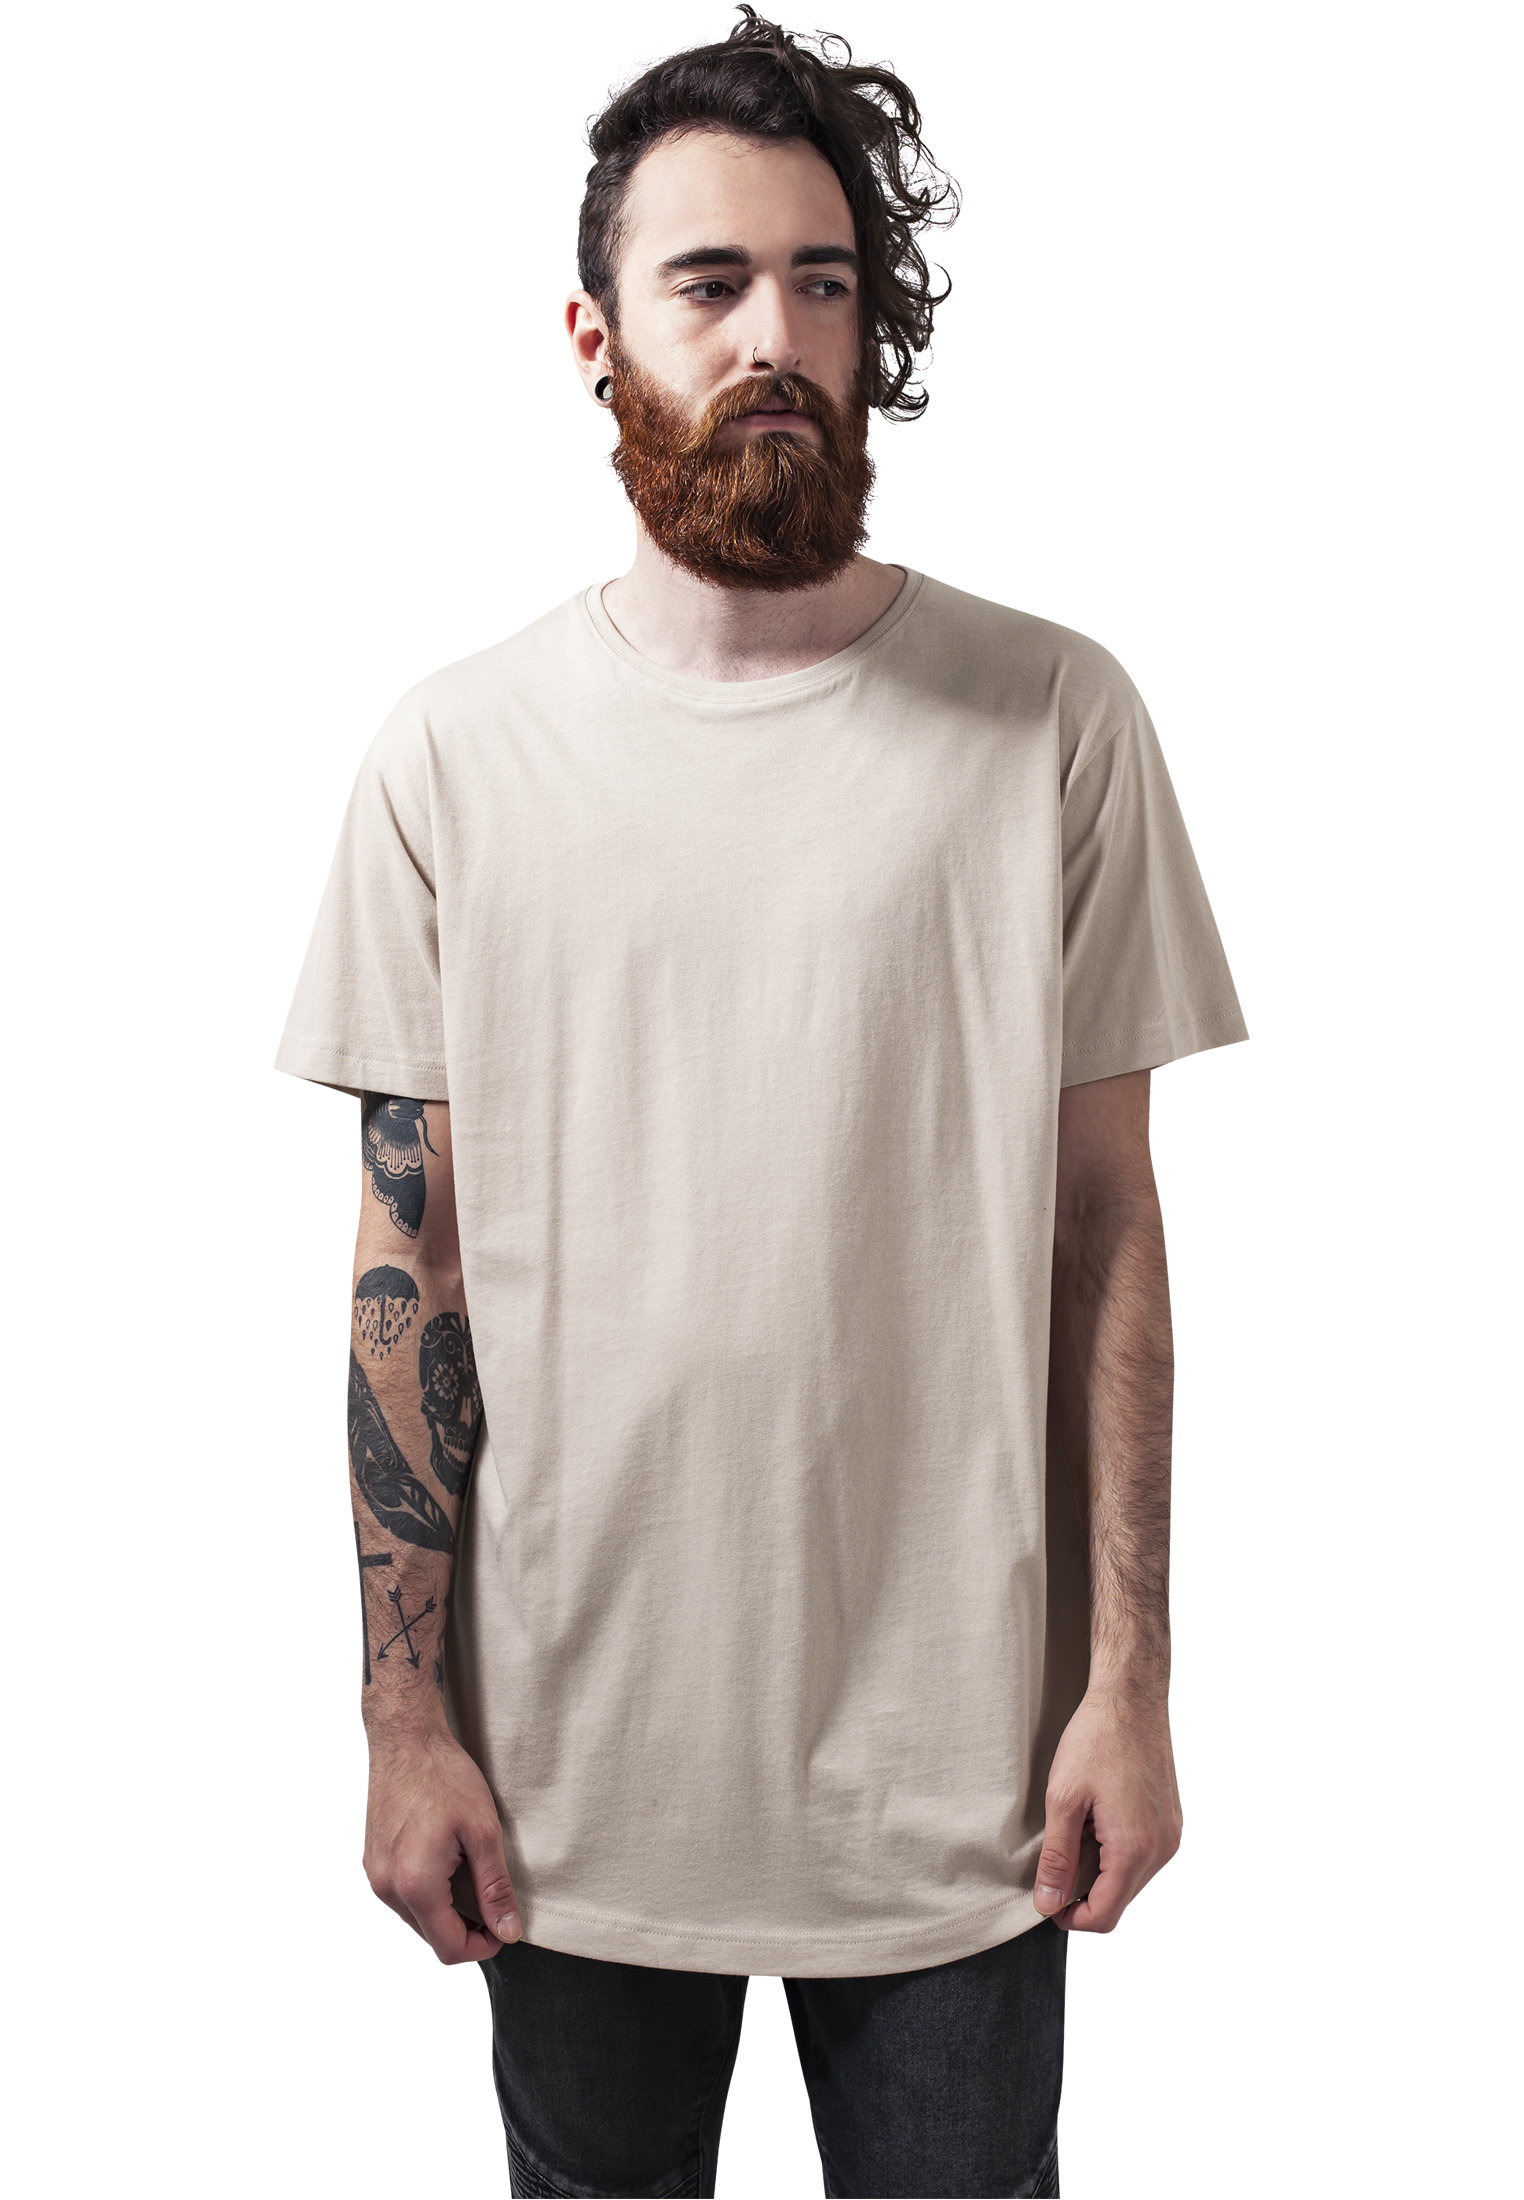 a90911000900 Urban Classics Herren T-Shirt Shaped Long Tee extra lang oversize ...